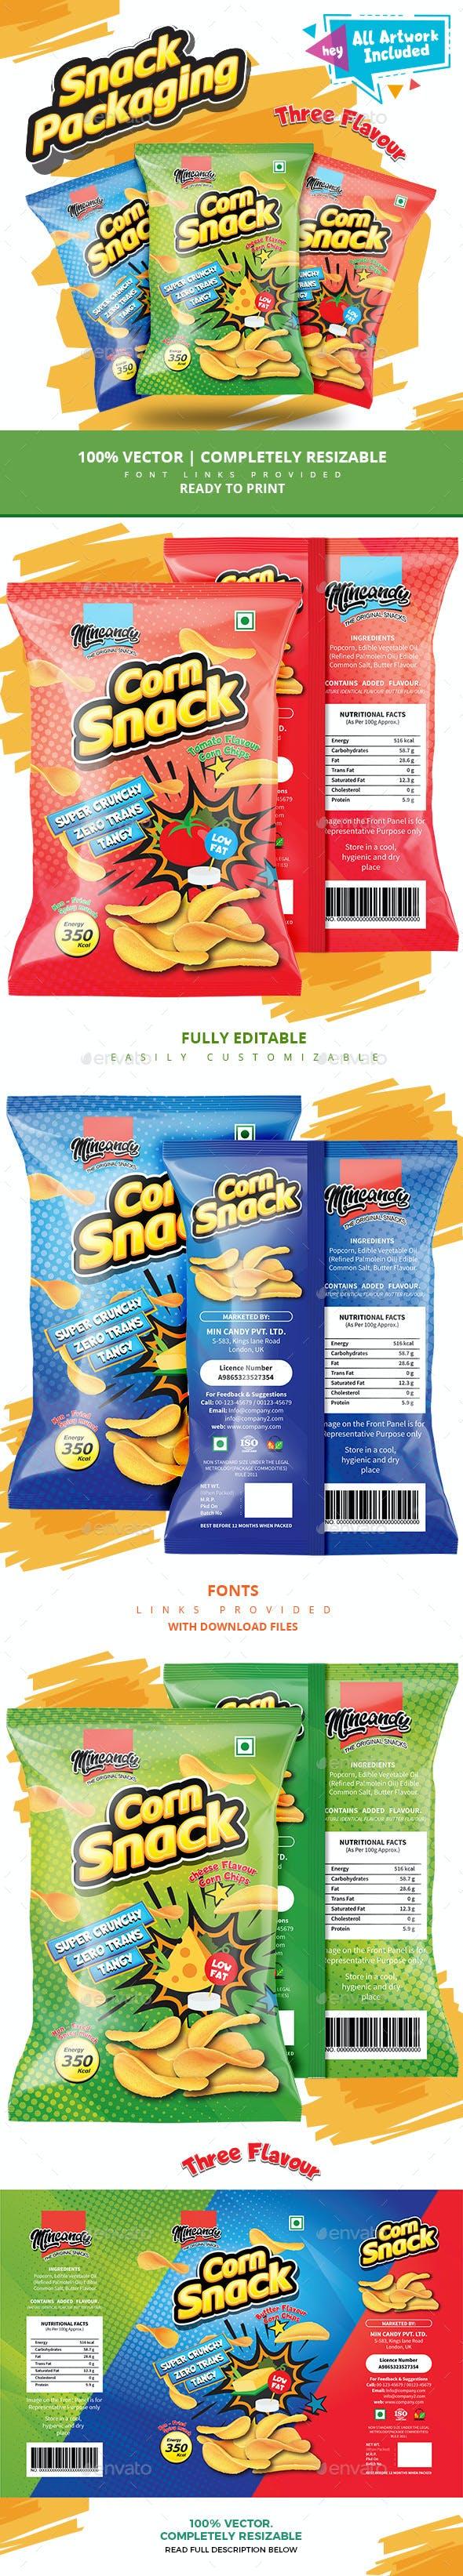 Chips/Snacks Packaging